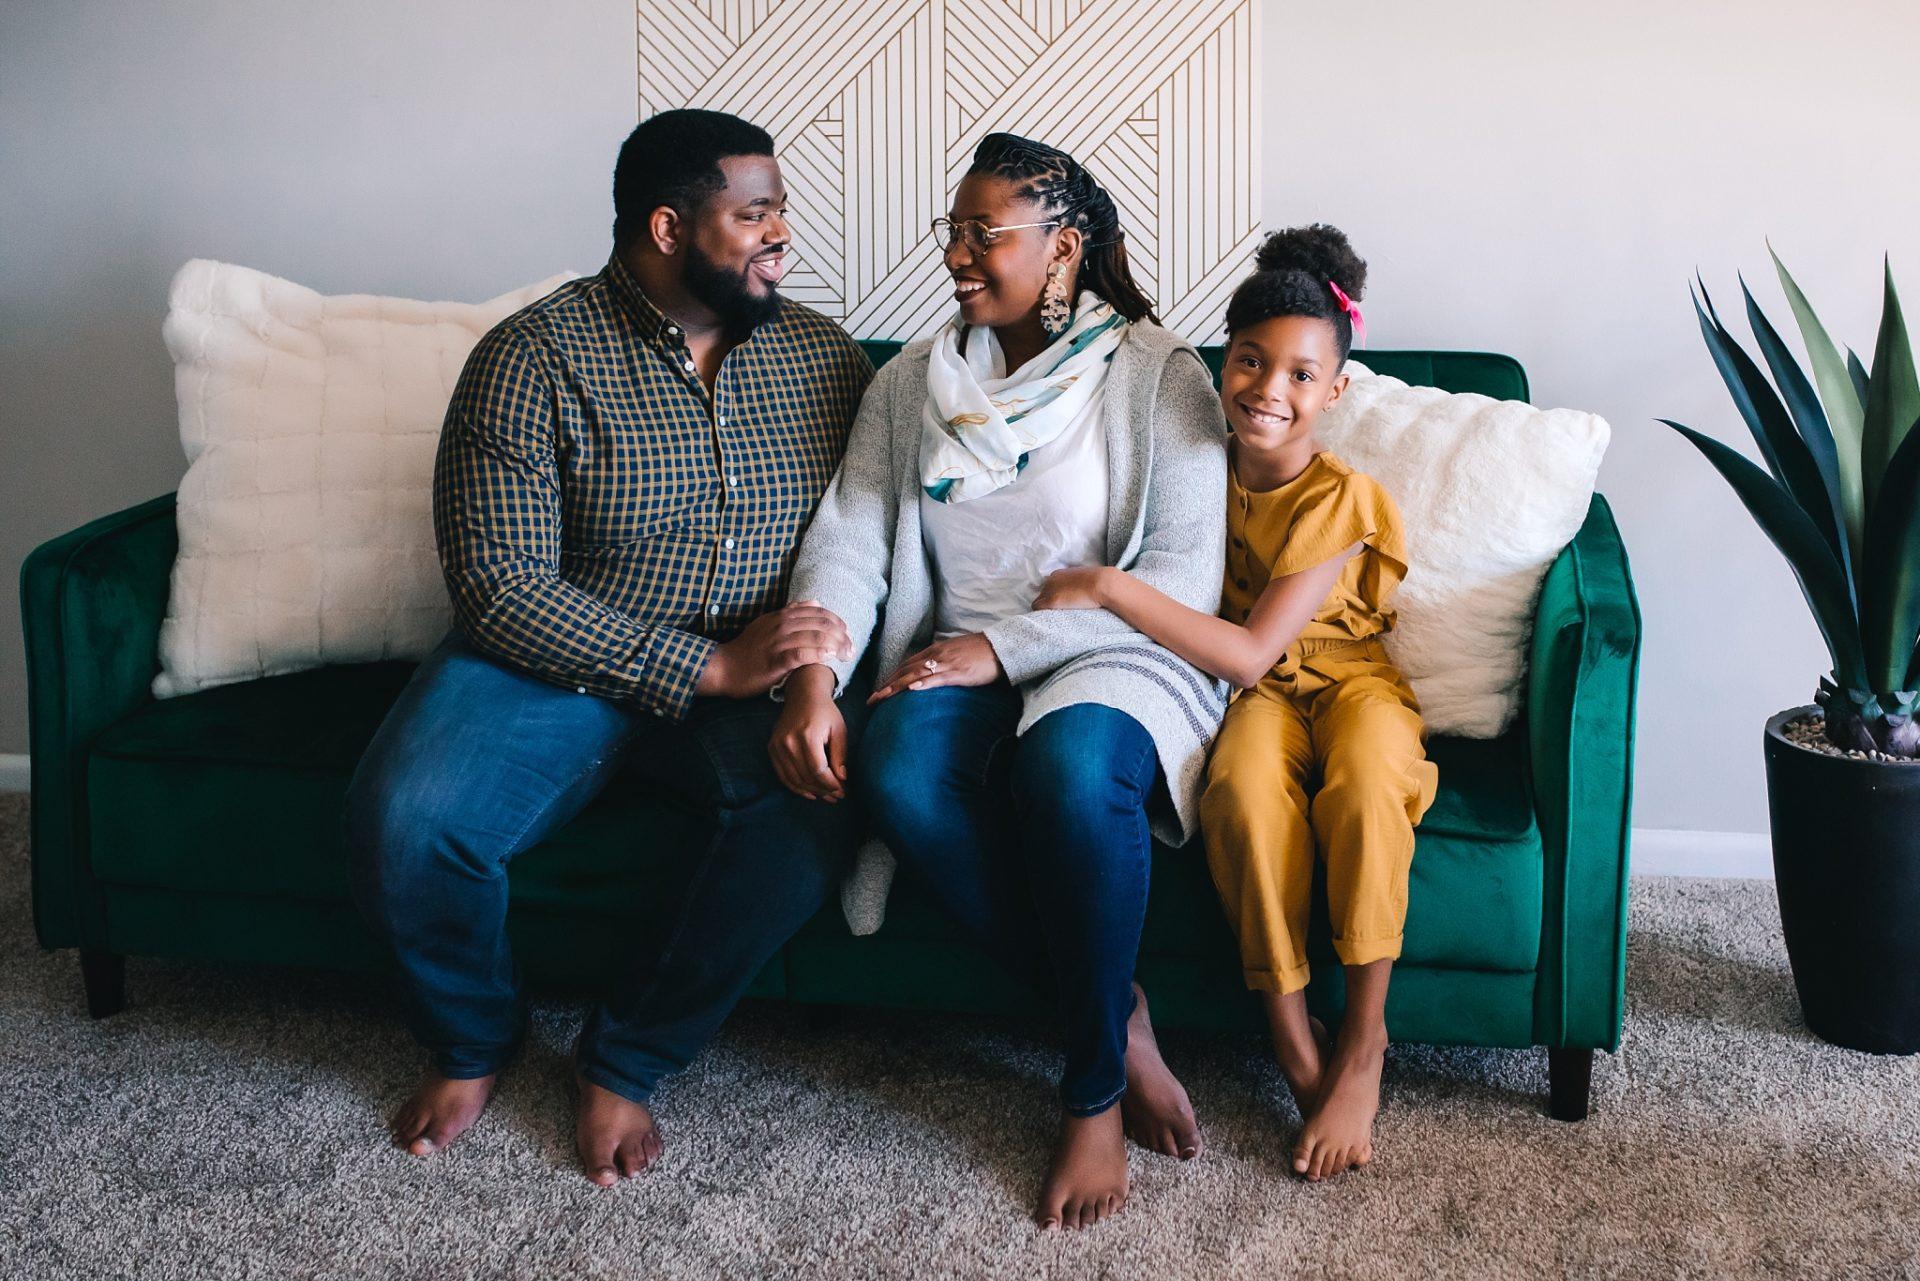 md-dc-va-family-photographer-tips-for-smiles